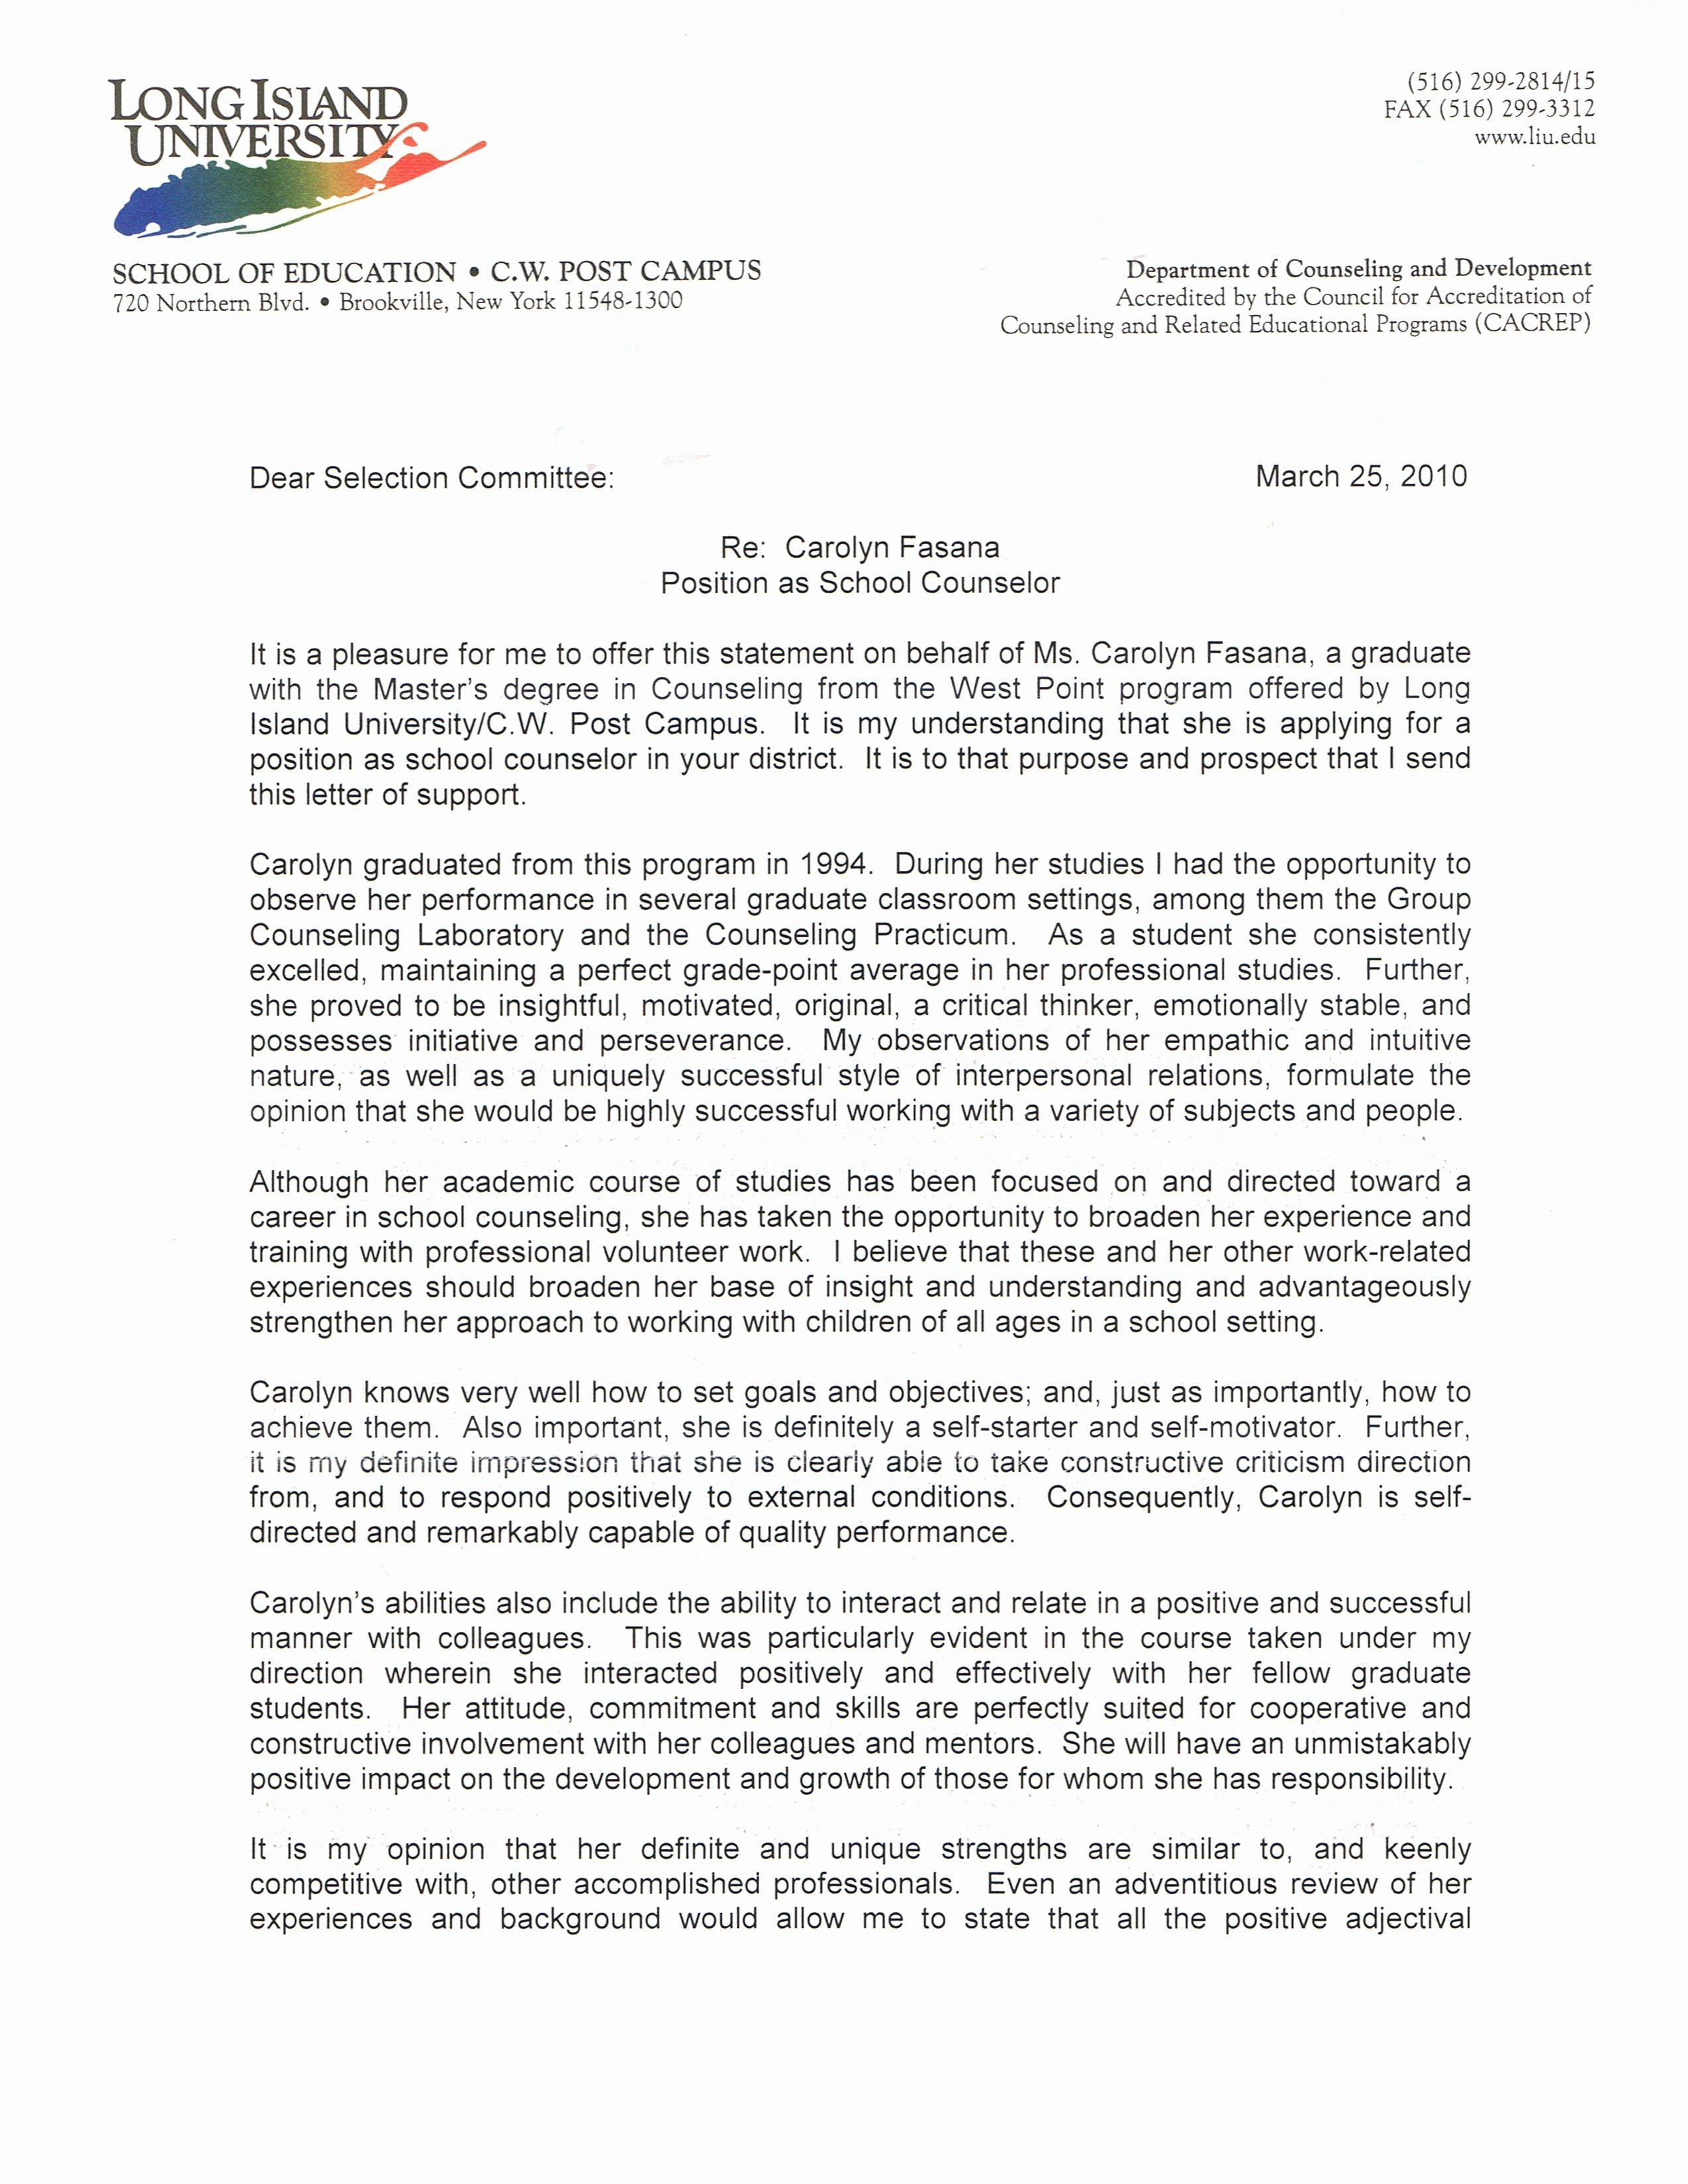 Sample Professional Letter Of Recommendation Elegant Letters Of Re Mendation